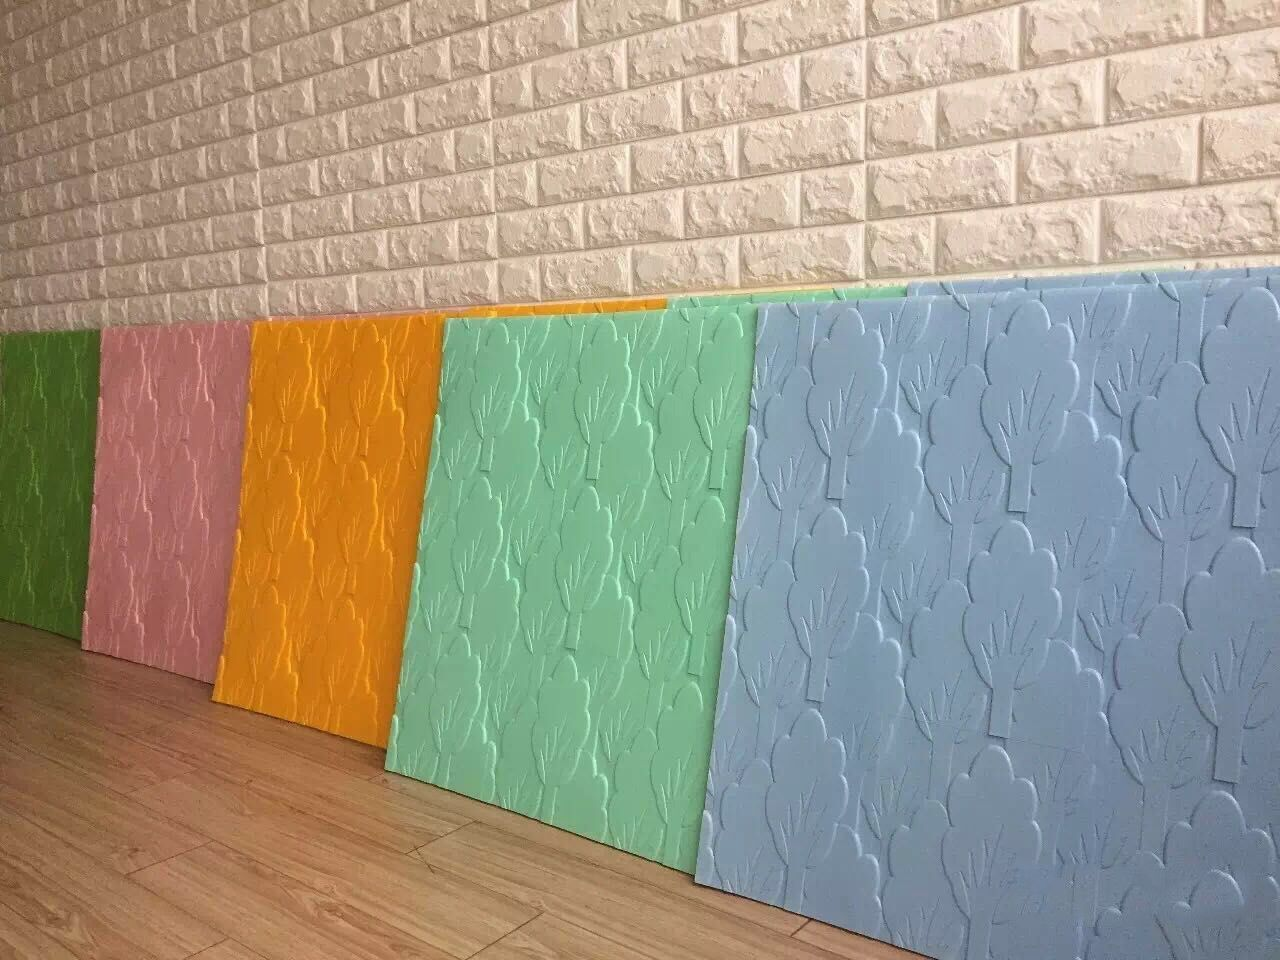 Interior Exterior For Home Decoration3d Wall Paper Embossed Decorative Wall Skin 3d Lightweight Pe Foam Wallpape Wall Wallpaper Kids Room Wallpaper Wallpaper